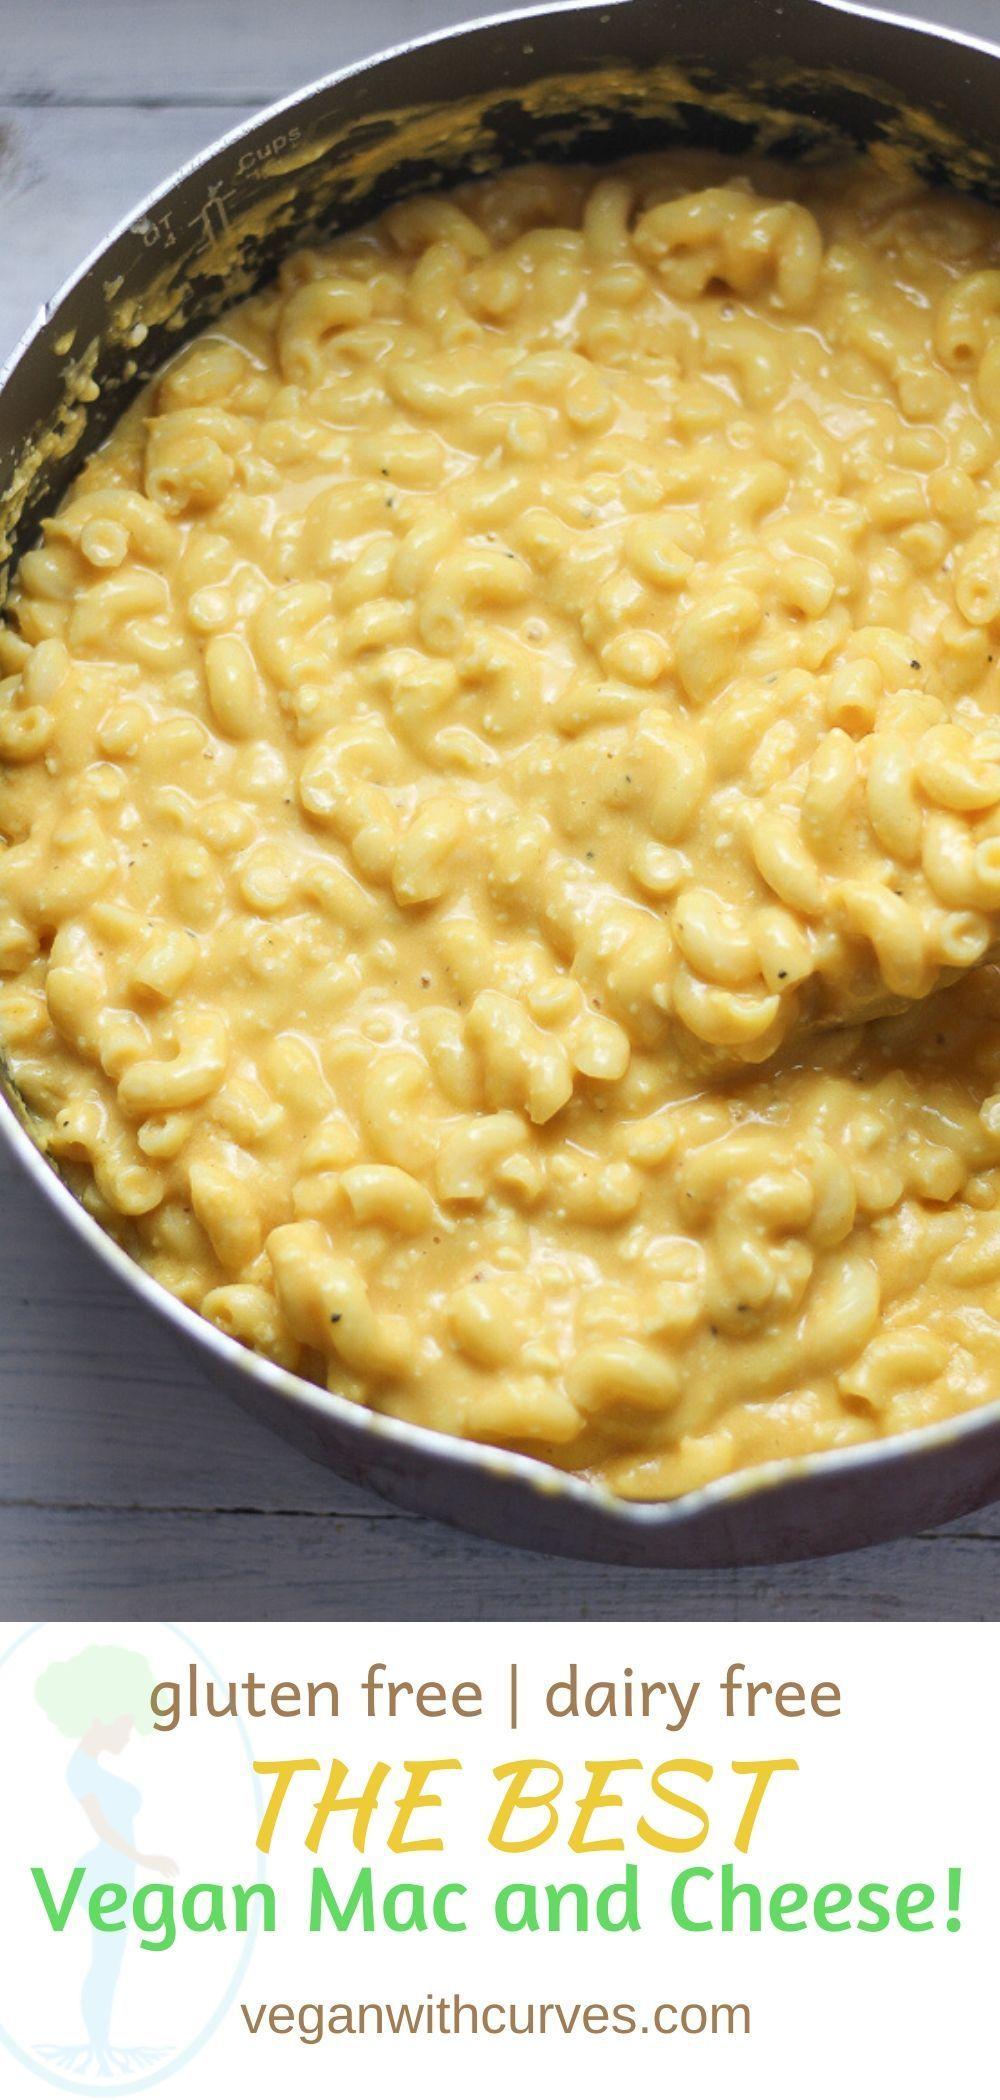 The Best Dairy Free Mac And Cheese Vegan Plus Gluten Free Recipe In 2020 Dairy Free Mac And Cheese Dairy Free Mac And Cheese